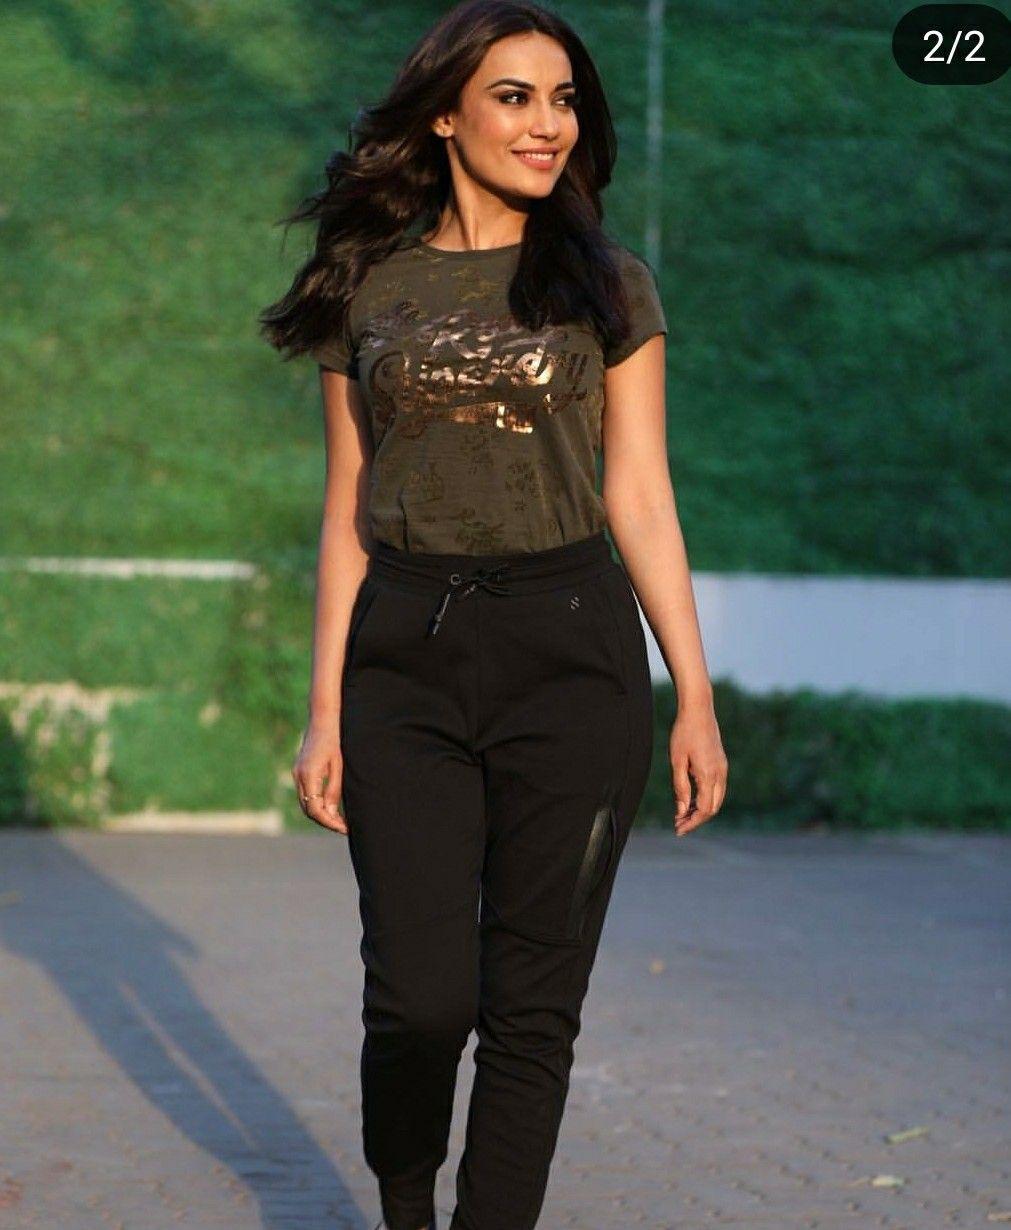 Jennifer Winget, Surbhi Jyoti, Reem Shaikh: Who Looks Stylish In BLACK PANT? 1